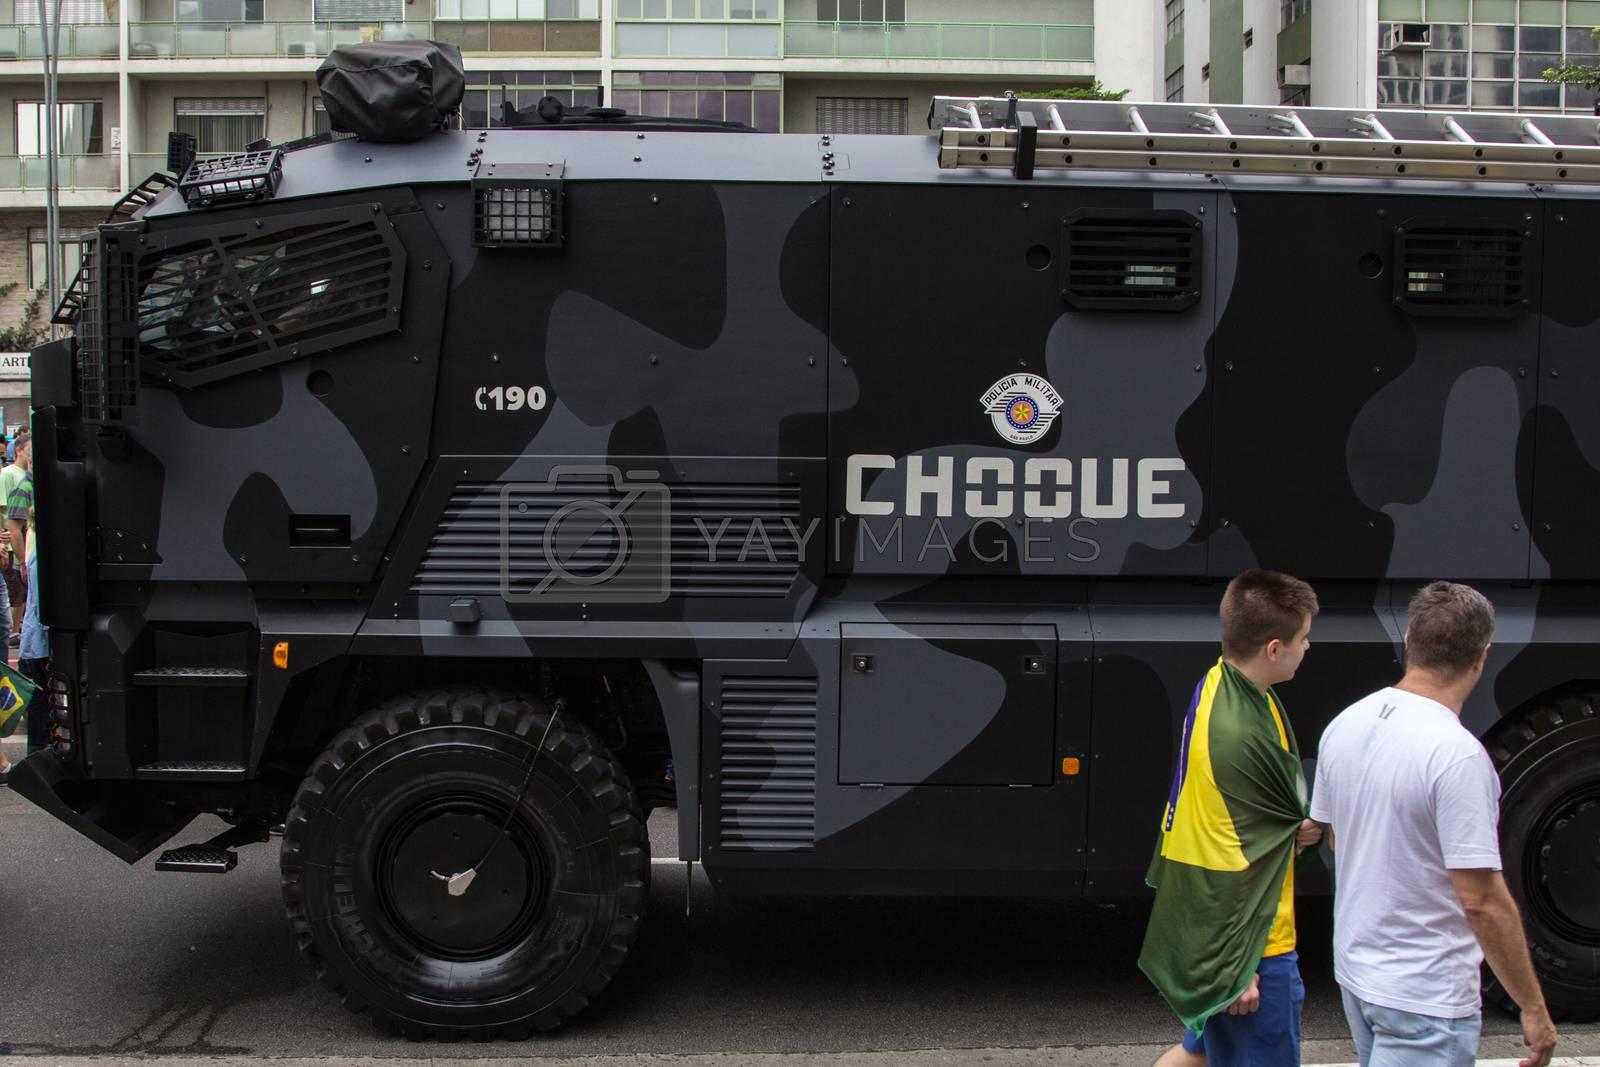 Sao Paulo Brazil March 13, 2016: One unidentified boy and an uni